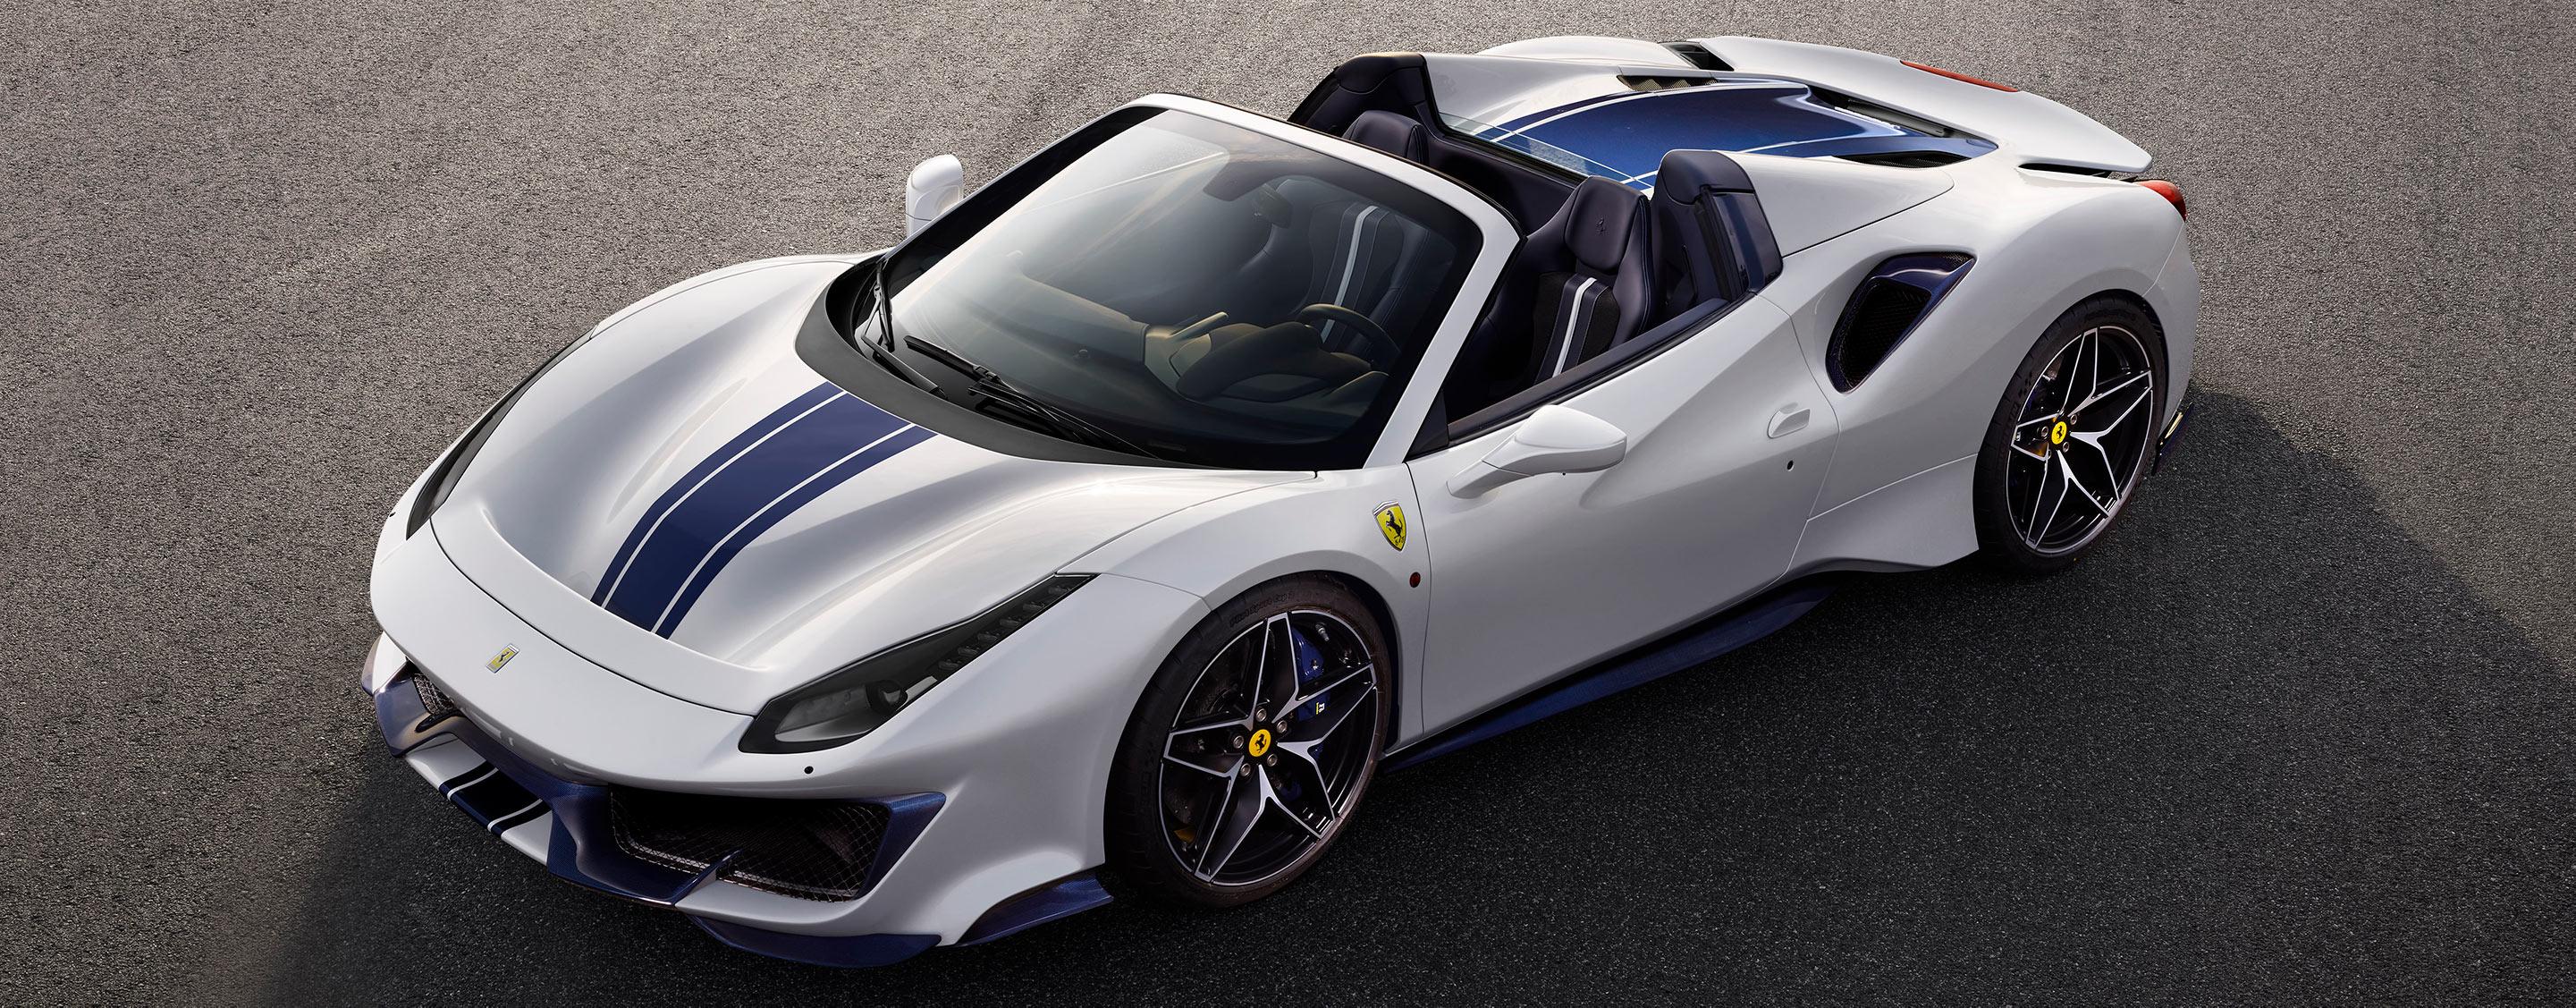 TrackWorthy - Ferrari 488 Pista Spider (1)